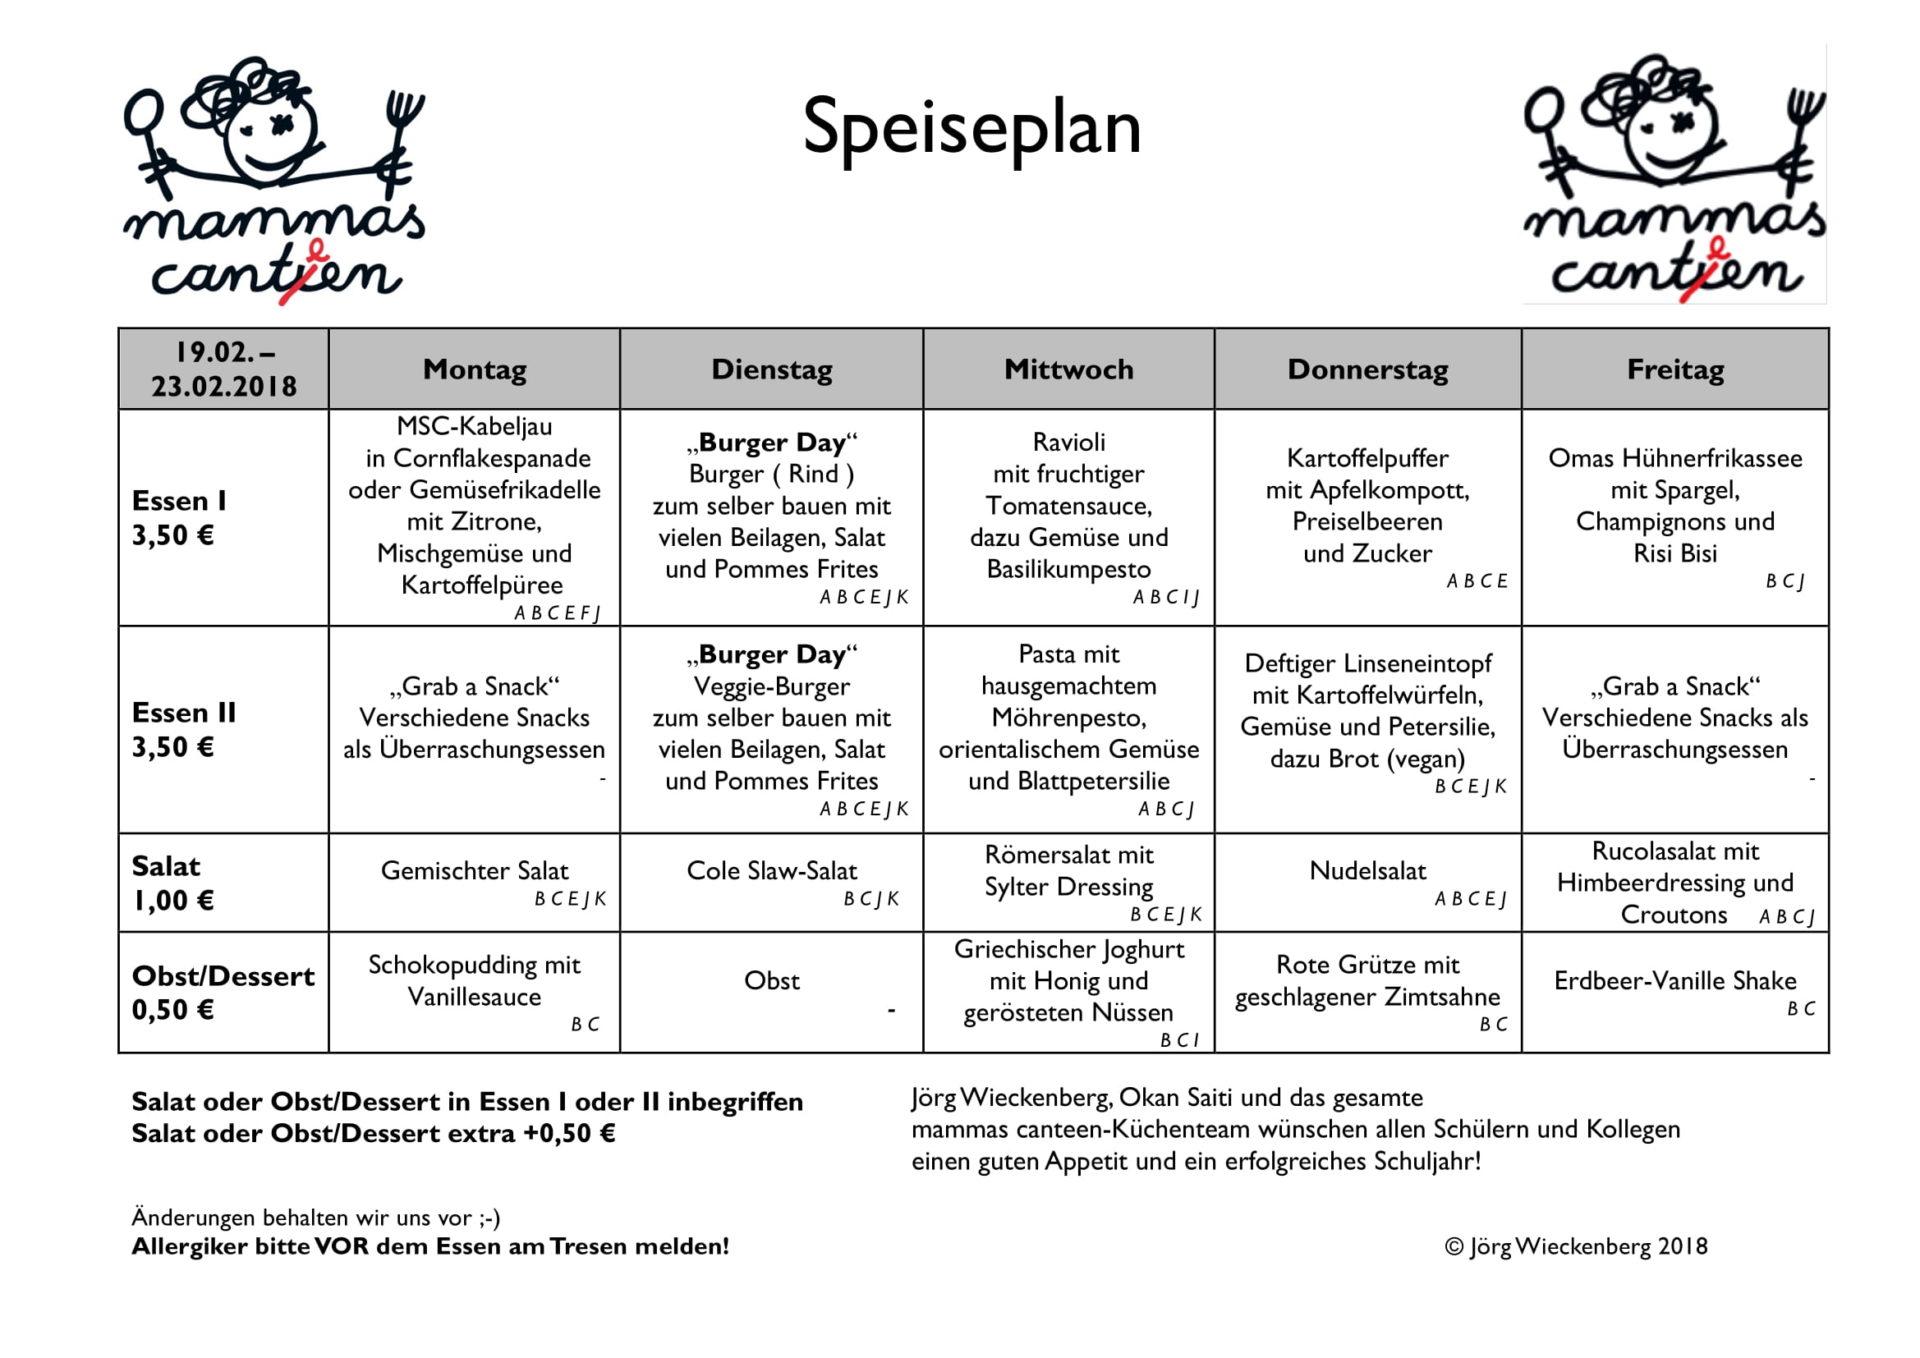 mammas canteen Speiseplan 19.02. -23.02.2018-1